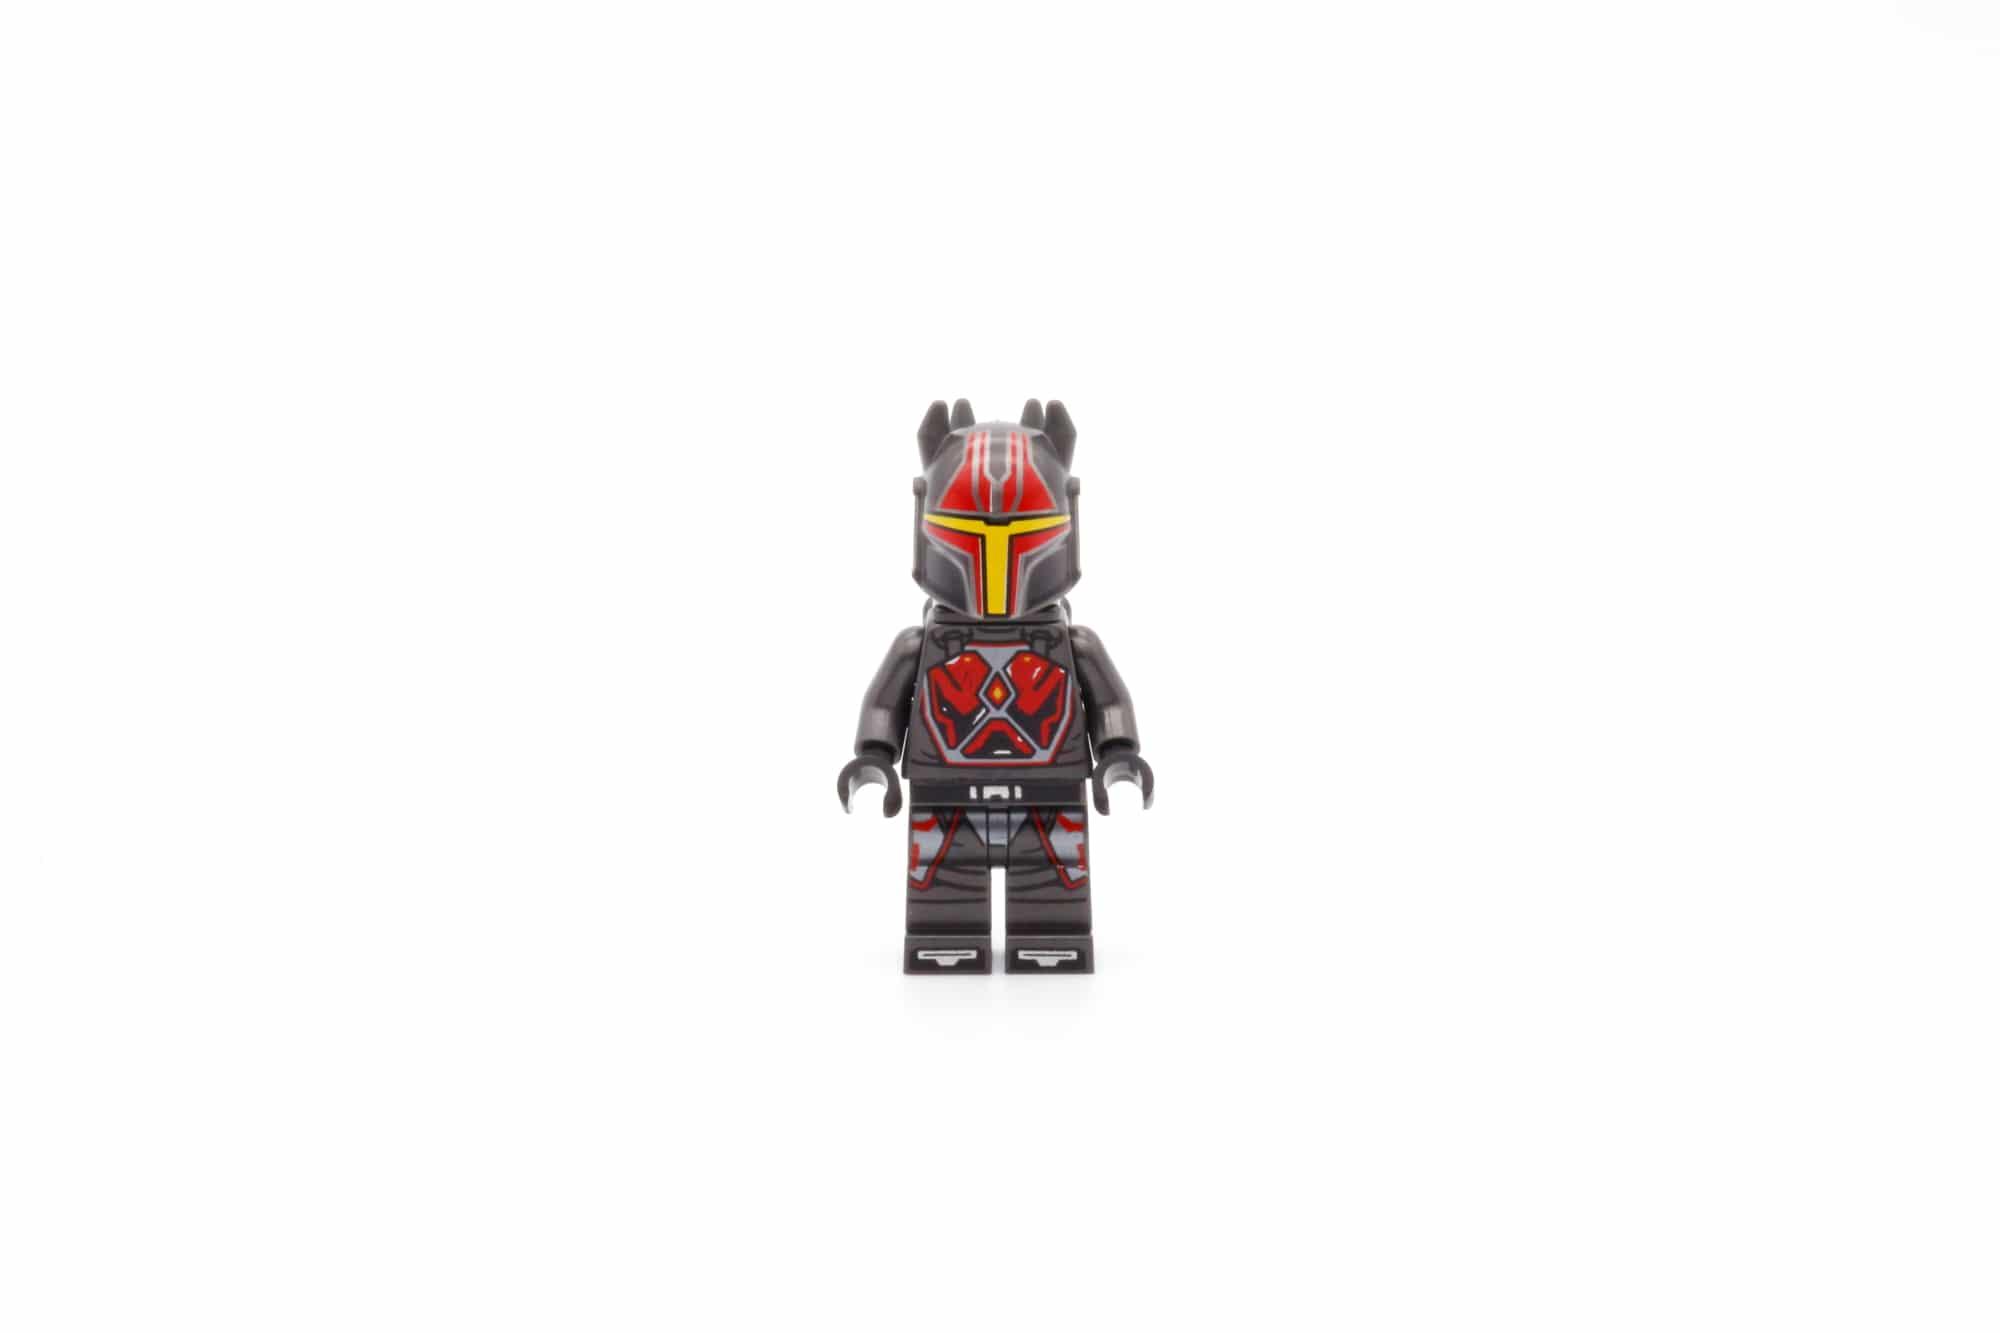 LEGO Star Wars 75316 Mandalorian Starfighter 7